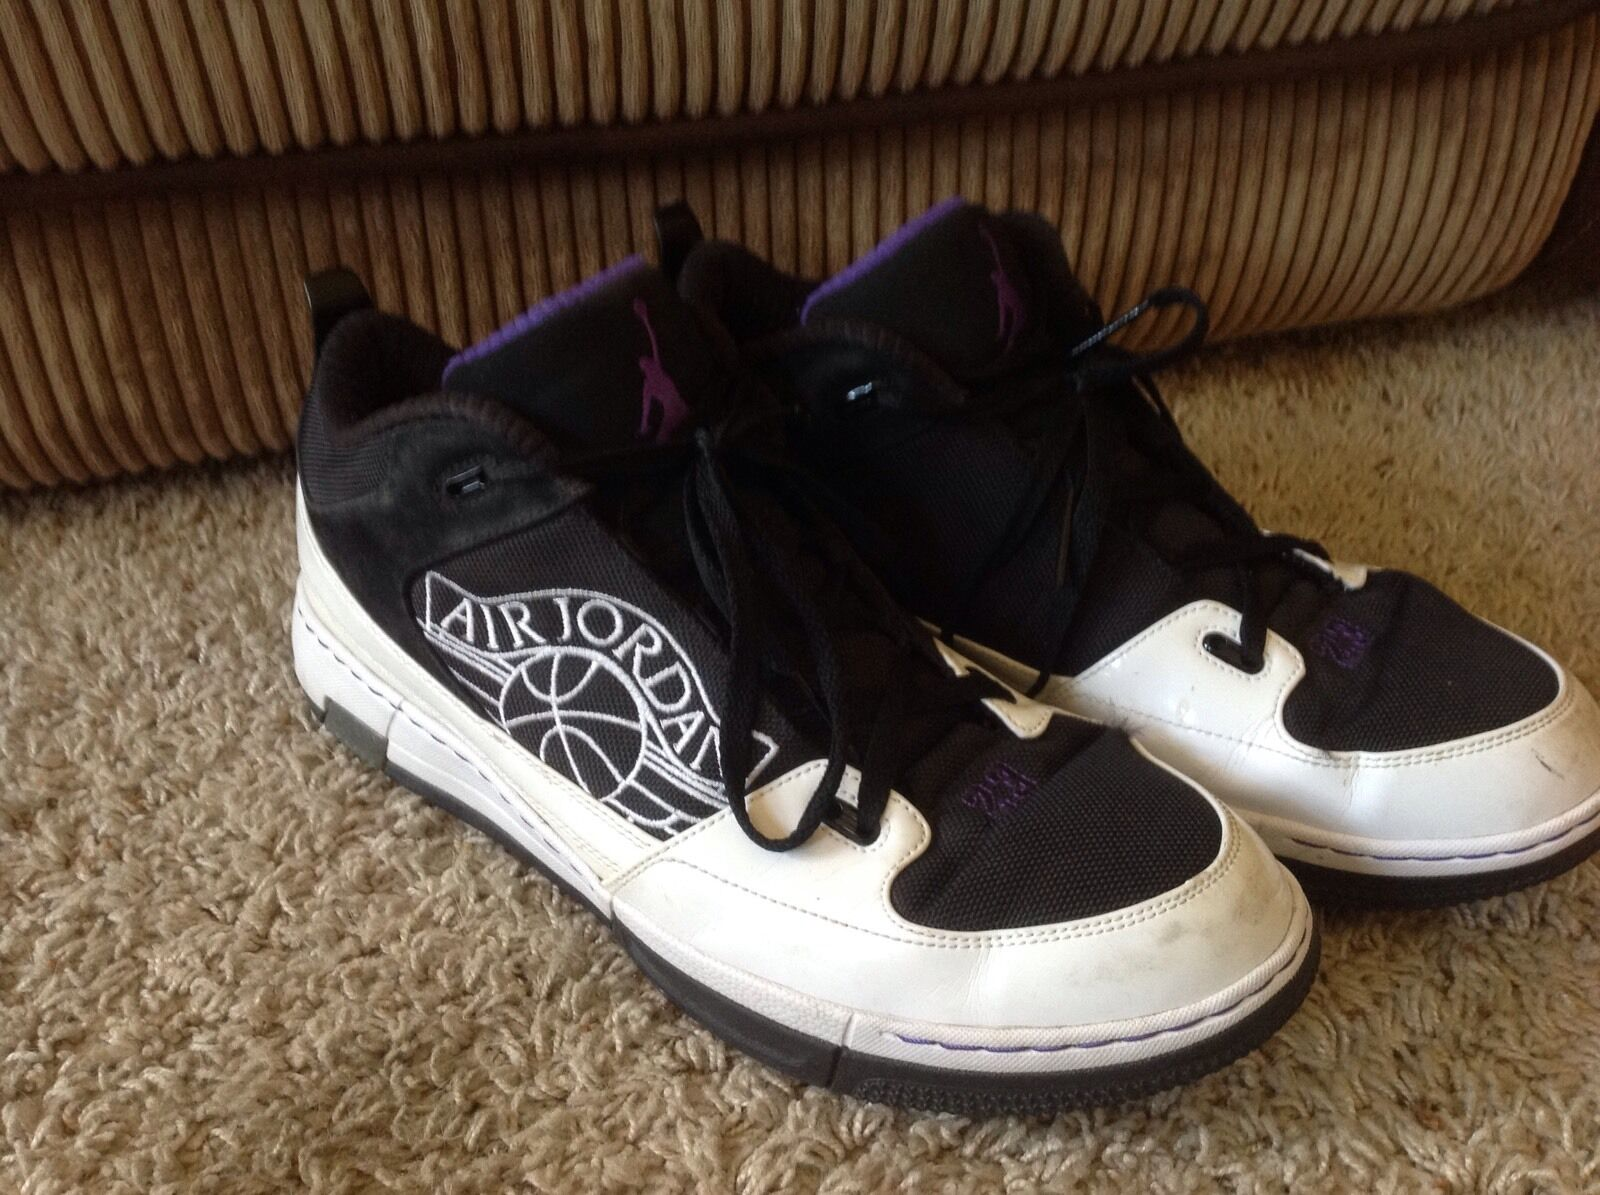 Air Jordan Men's Basketball Shoes Comfortable Cheap and beautiful fashion